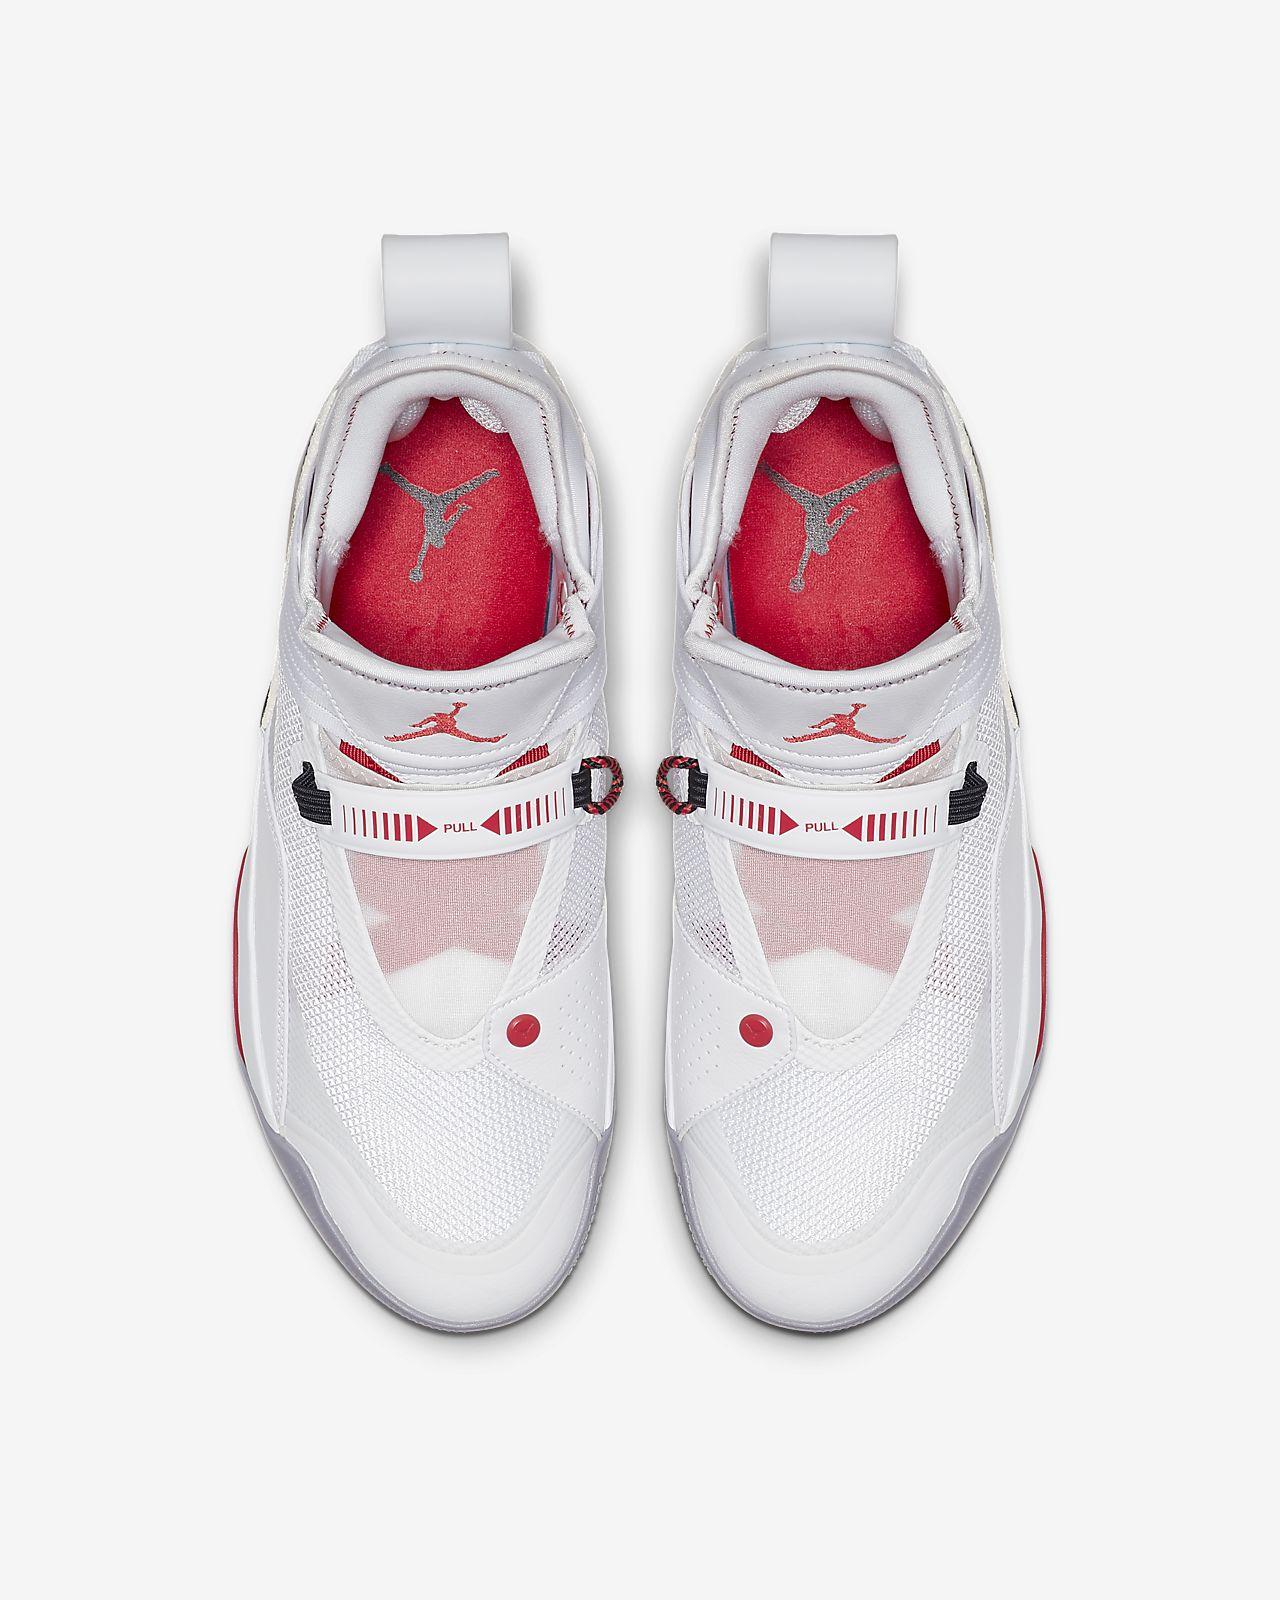 6c71d6917e2 Air Jordan XXXIII SE Basketball Shoe. Nike.com CA